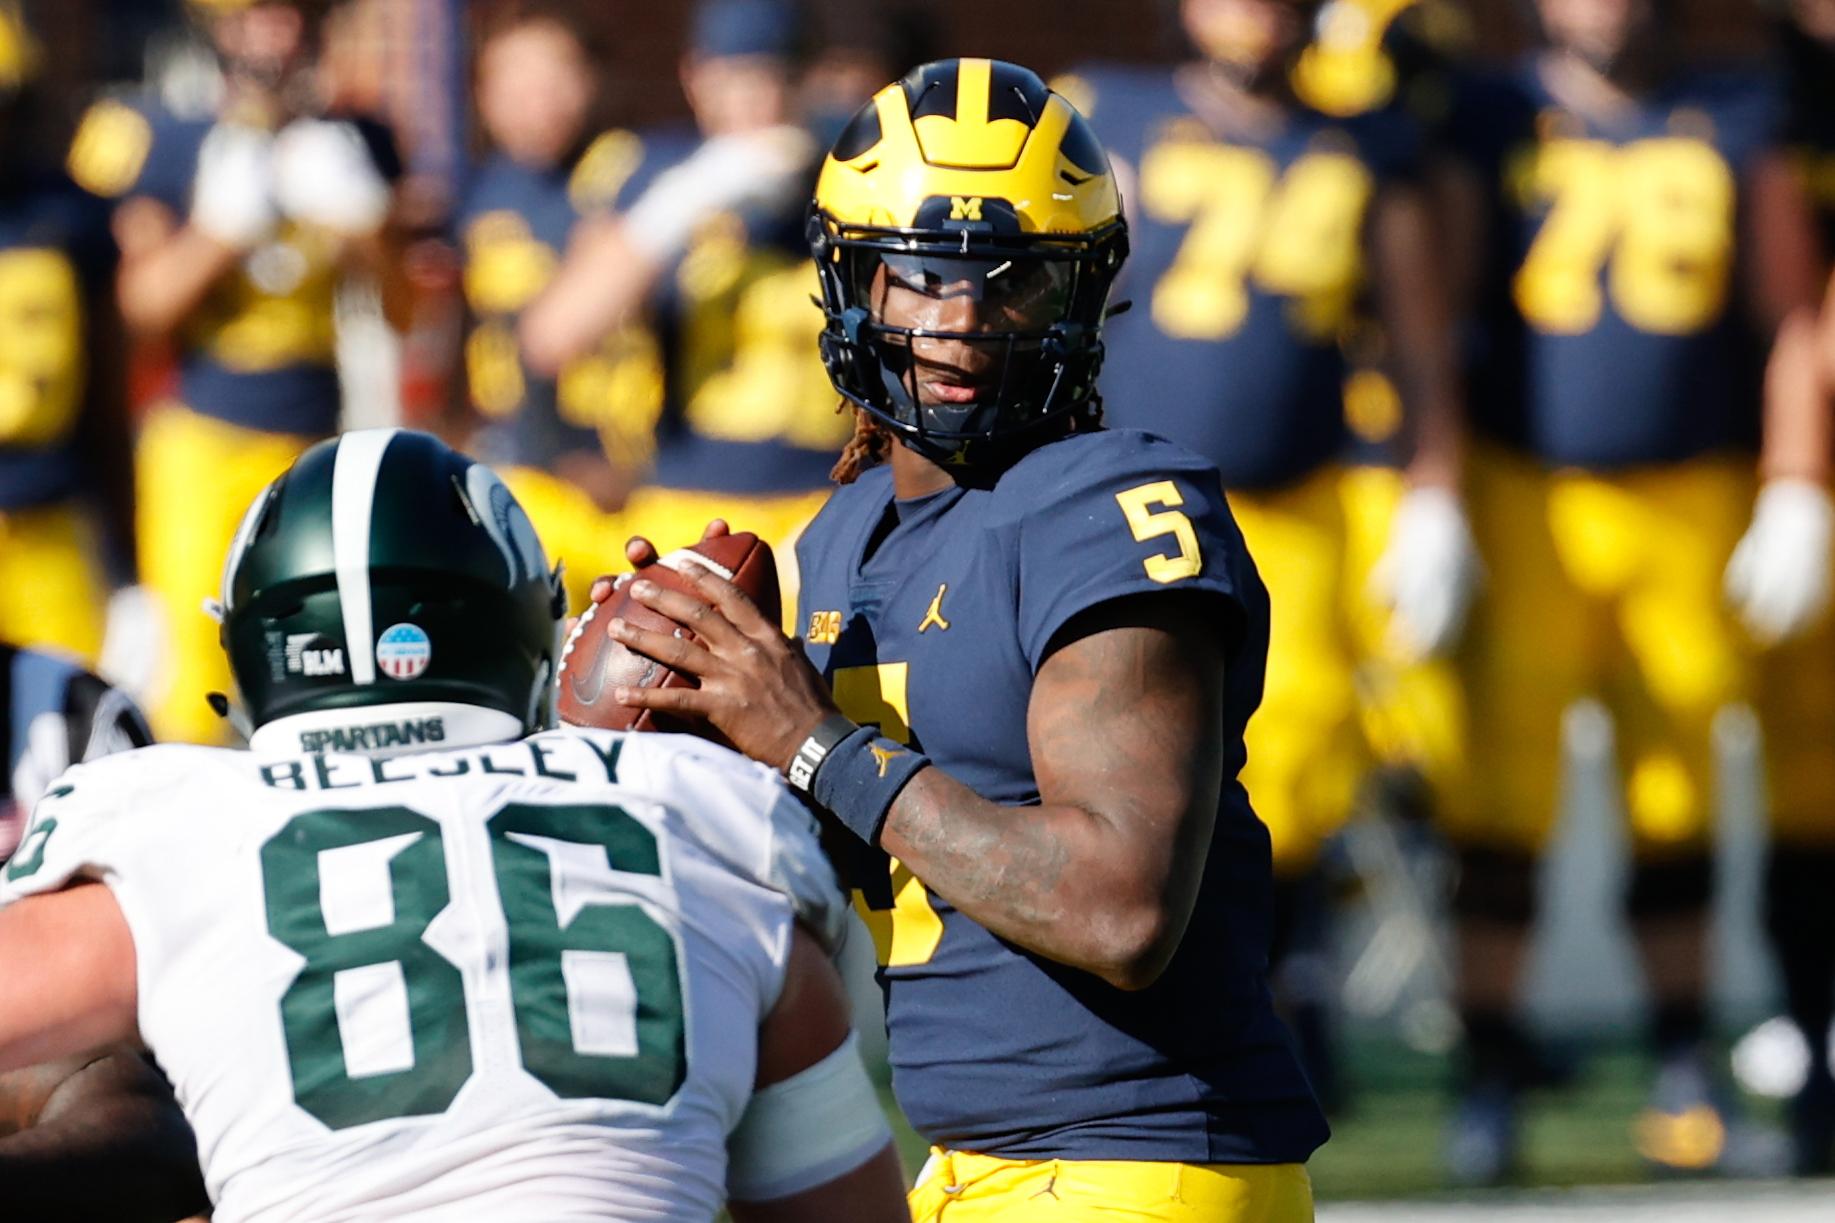 Michigan State at Michigan